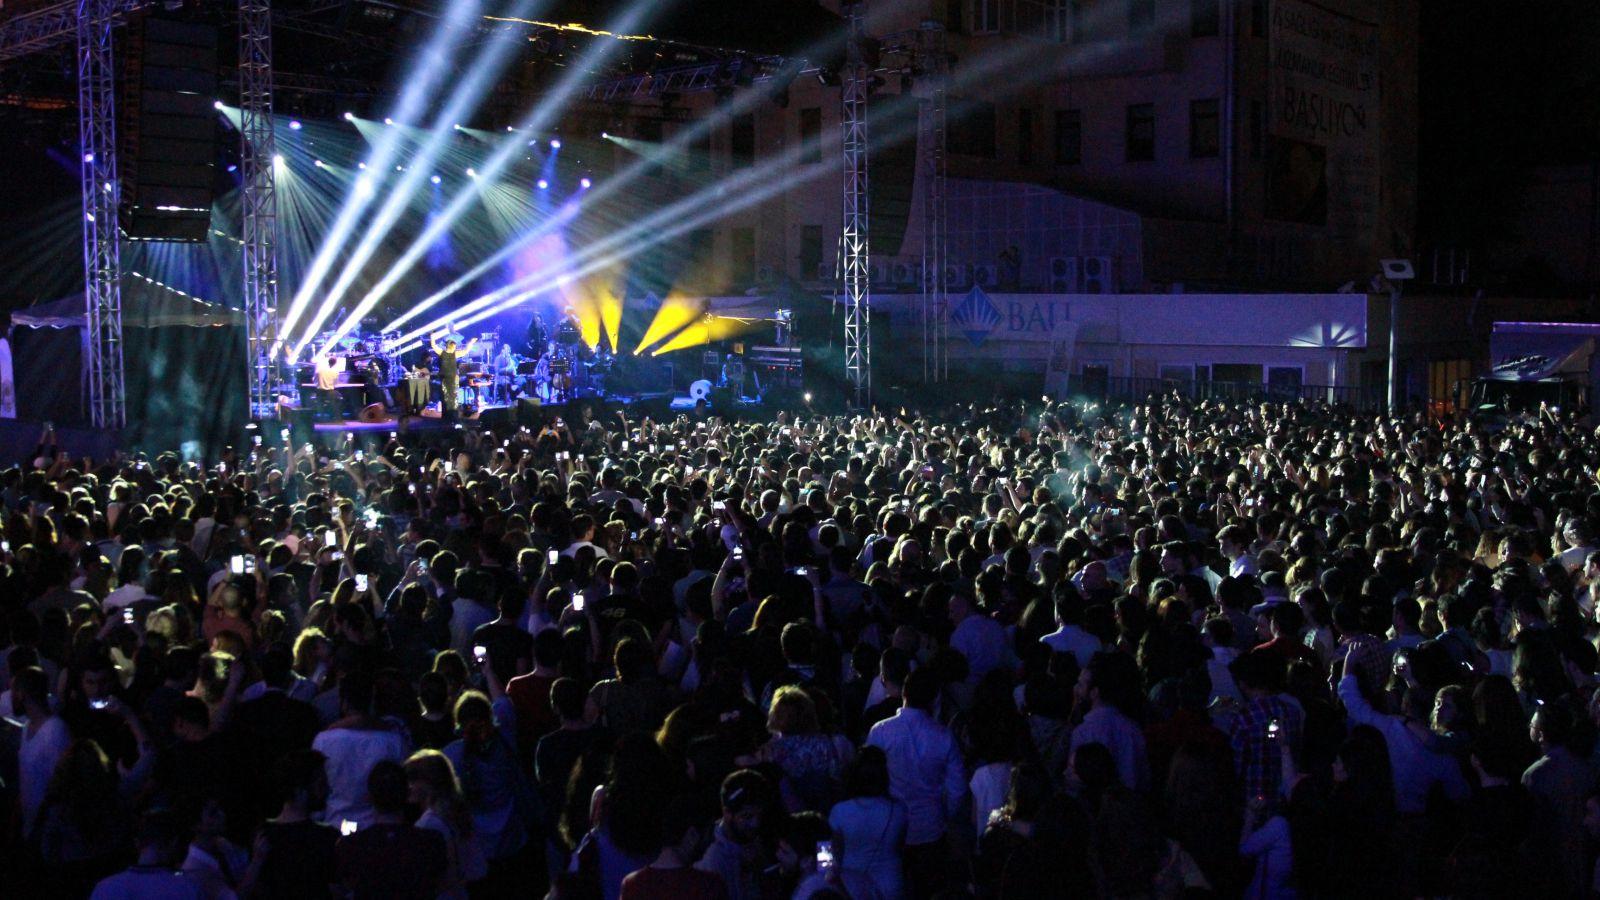 https://content.bau.edu.tr/bau, bi şehir, festival, mayfest, concert, live